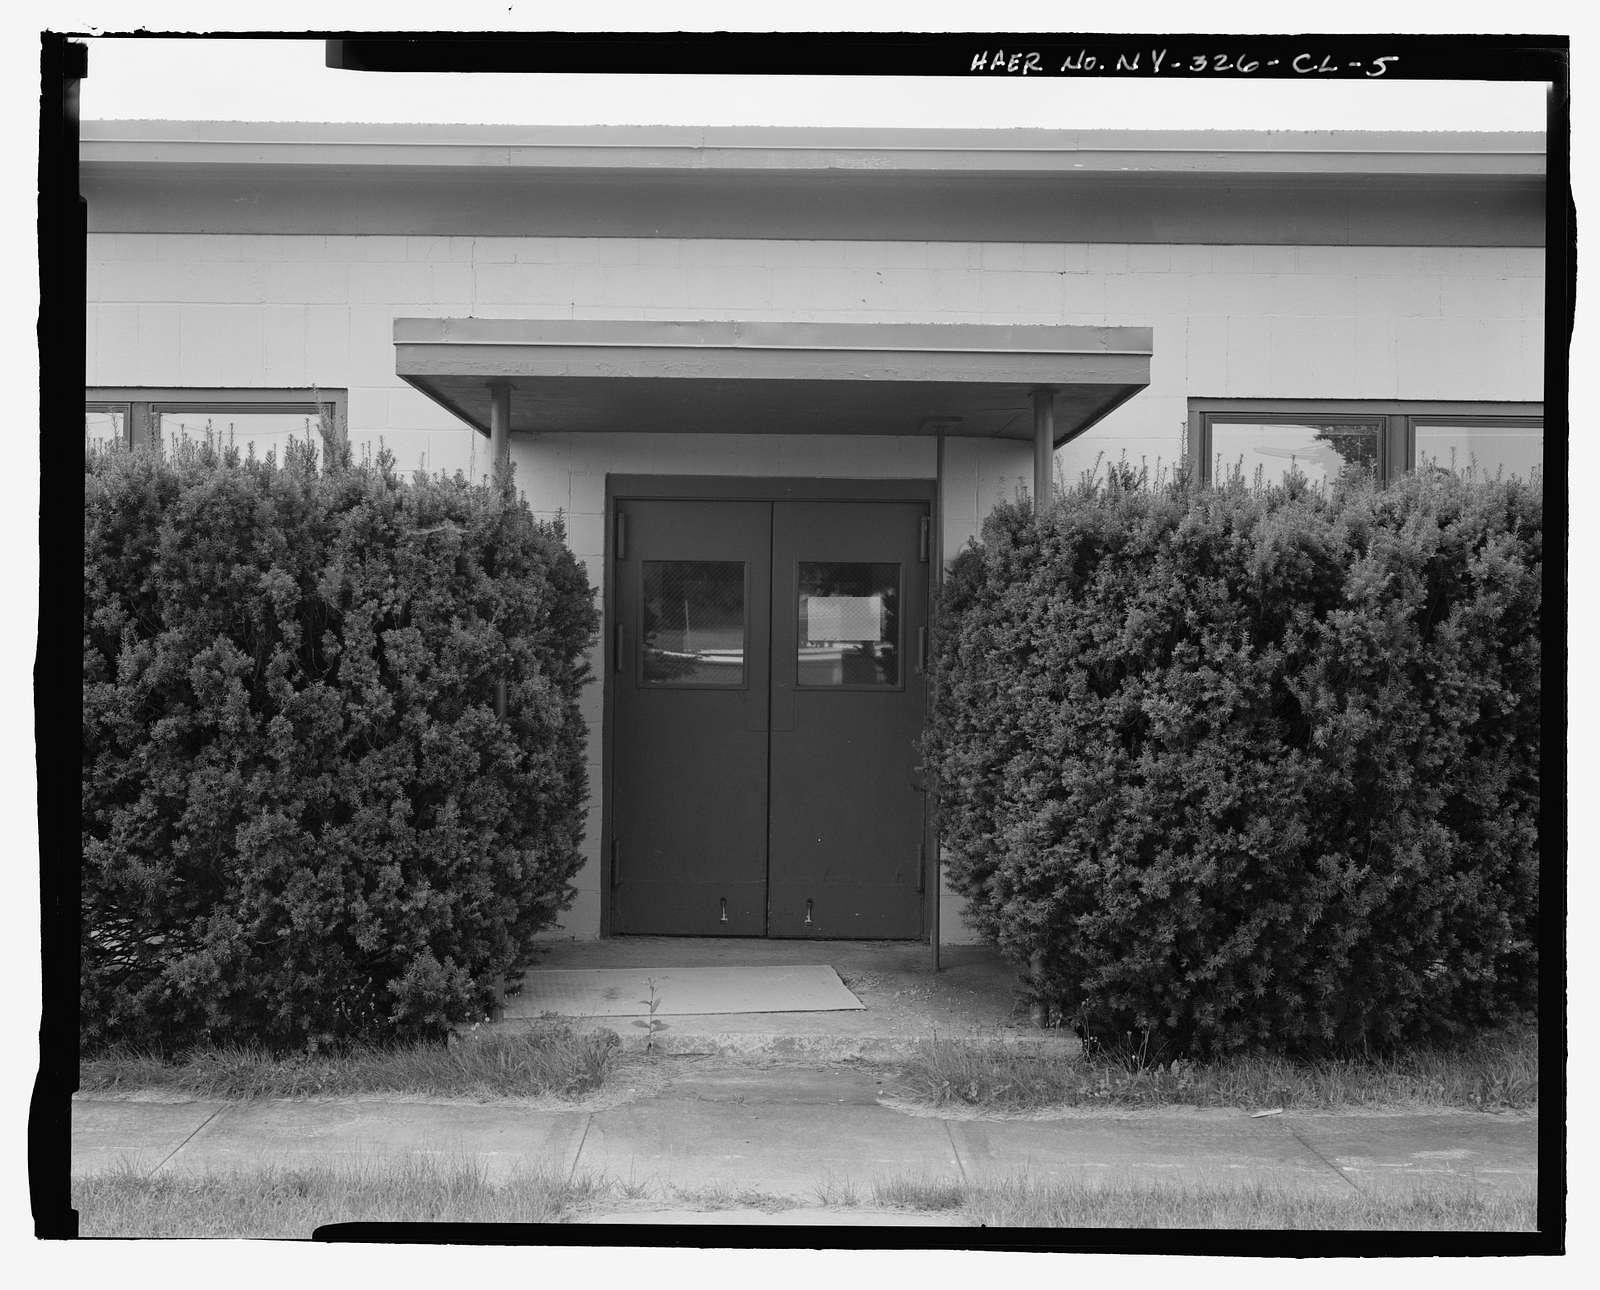 Plattsburgh Air Force Base, Fire Station, Arkansas Street, Plattsburgh, Clinton County, NY